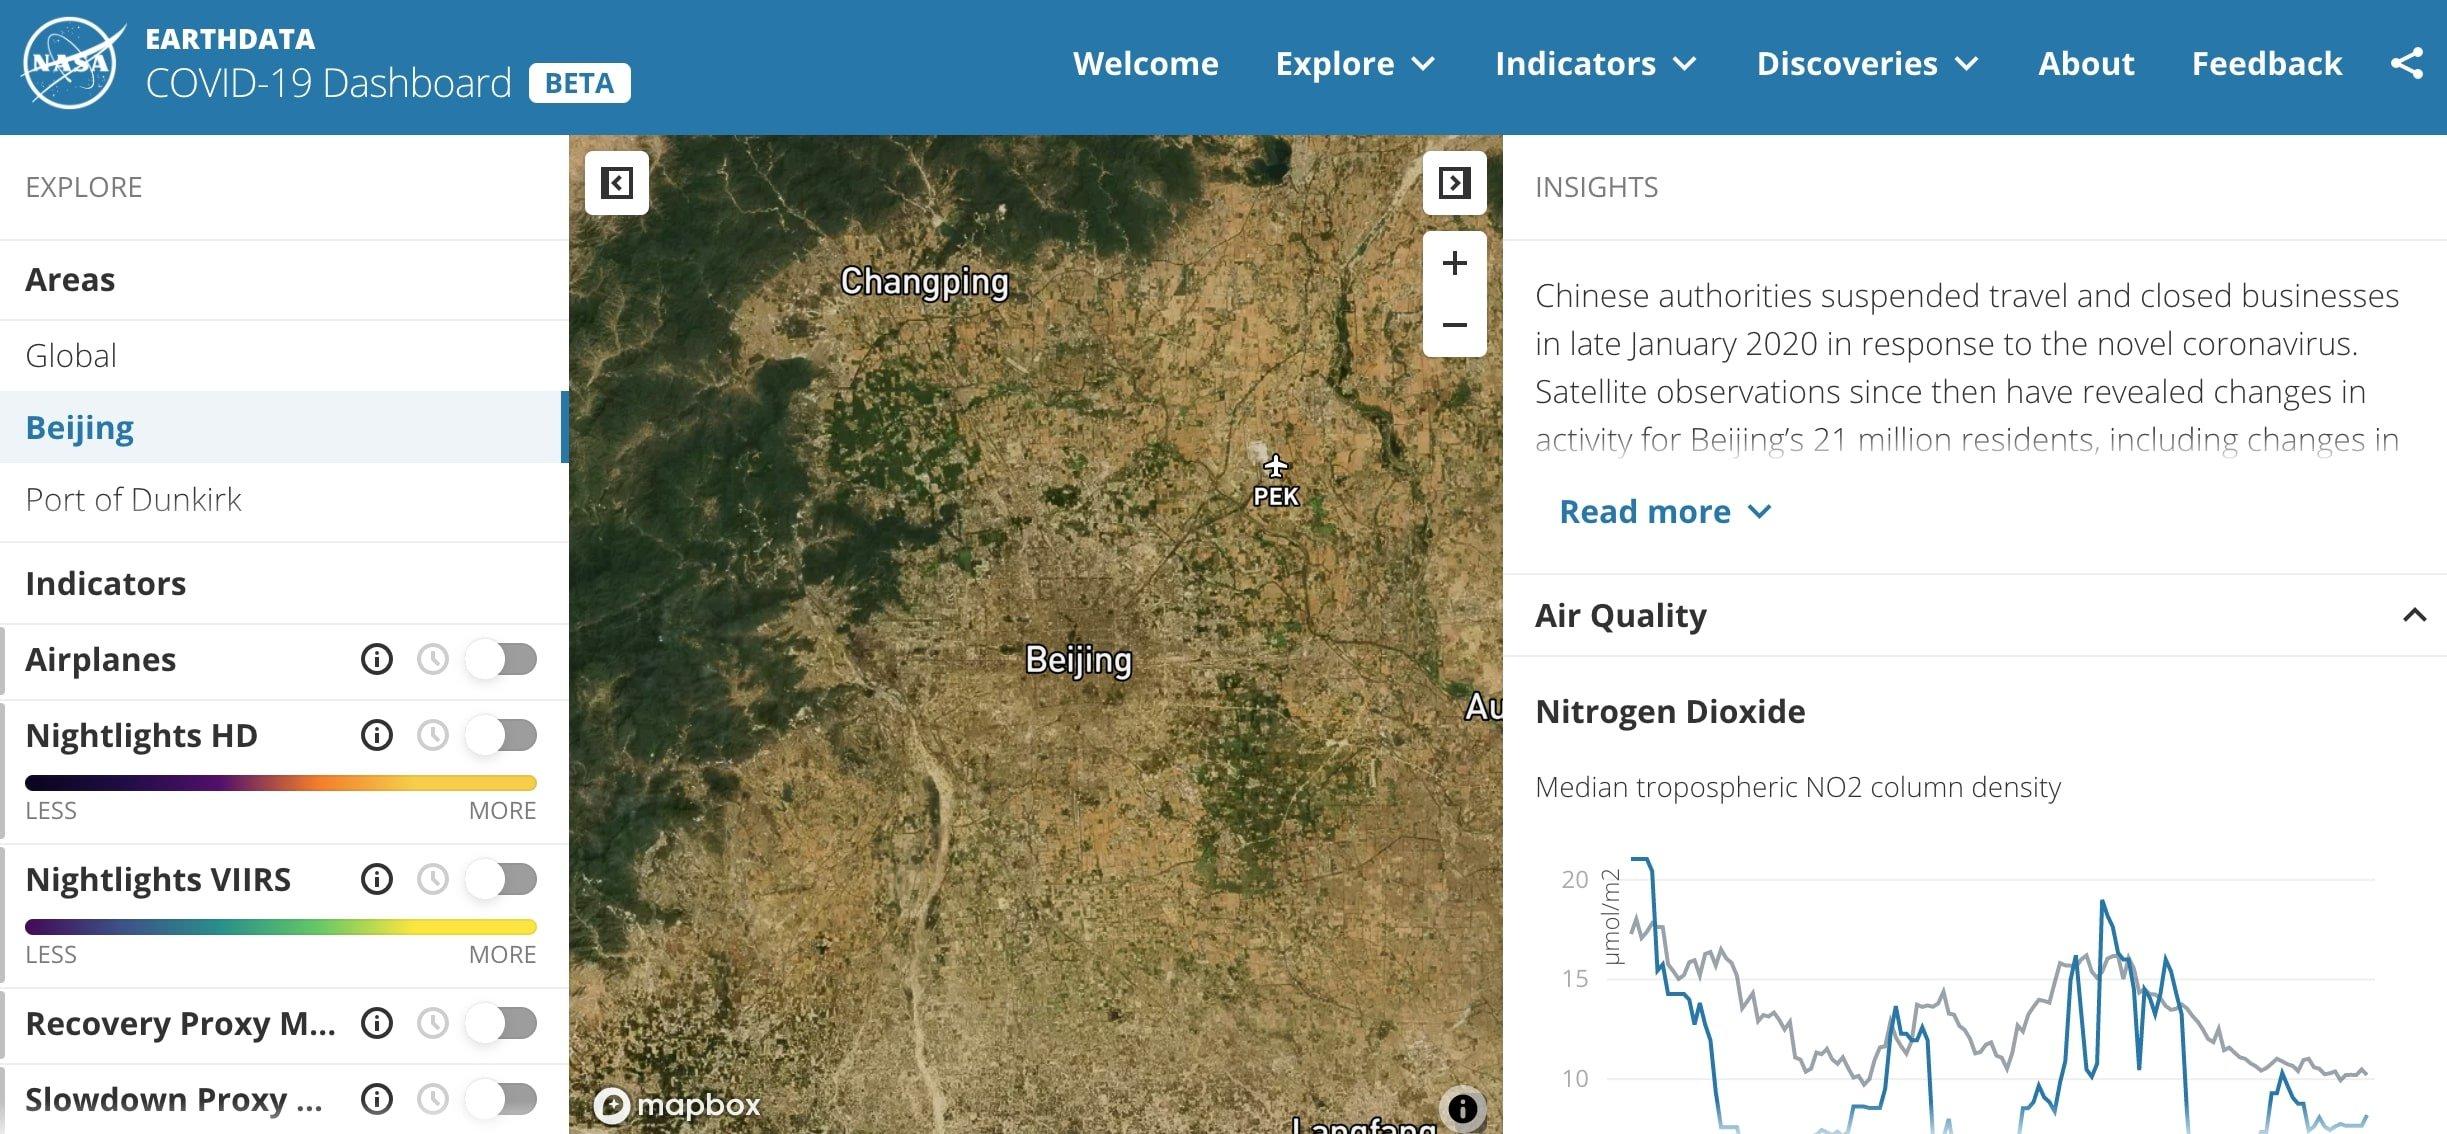 inquinamento atmosferico oggi satelliti nasa